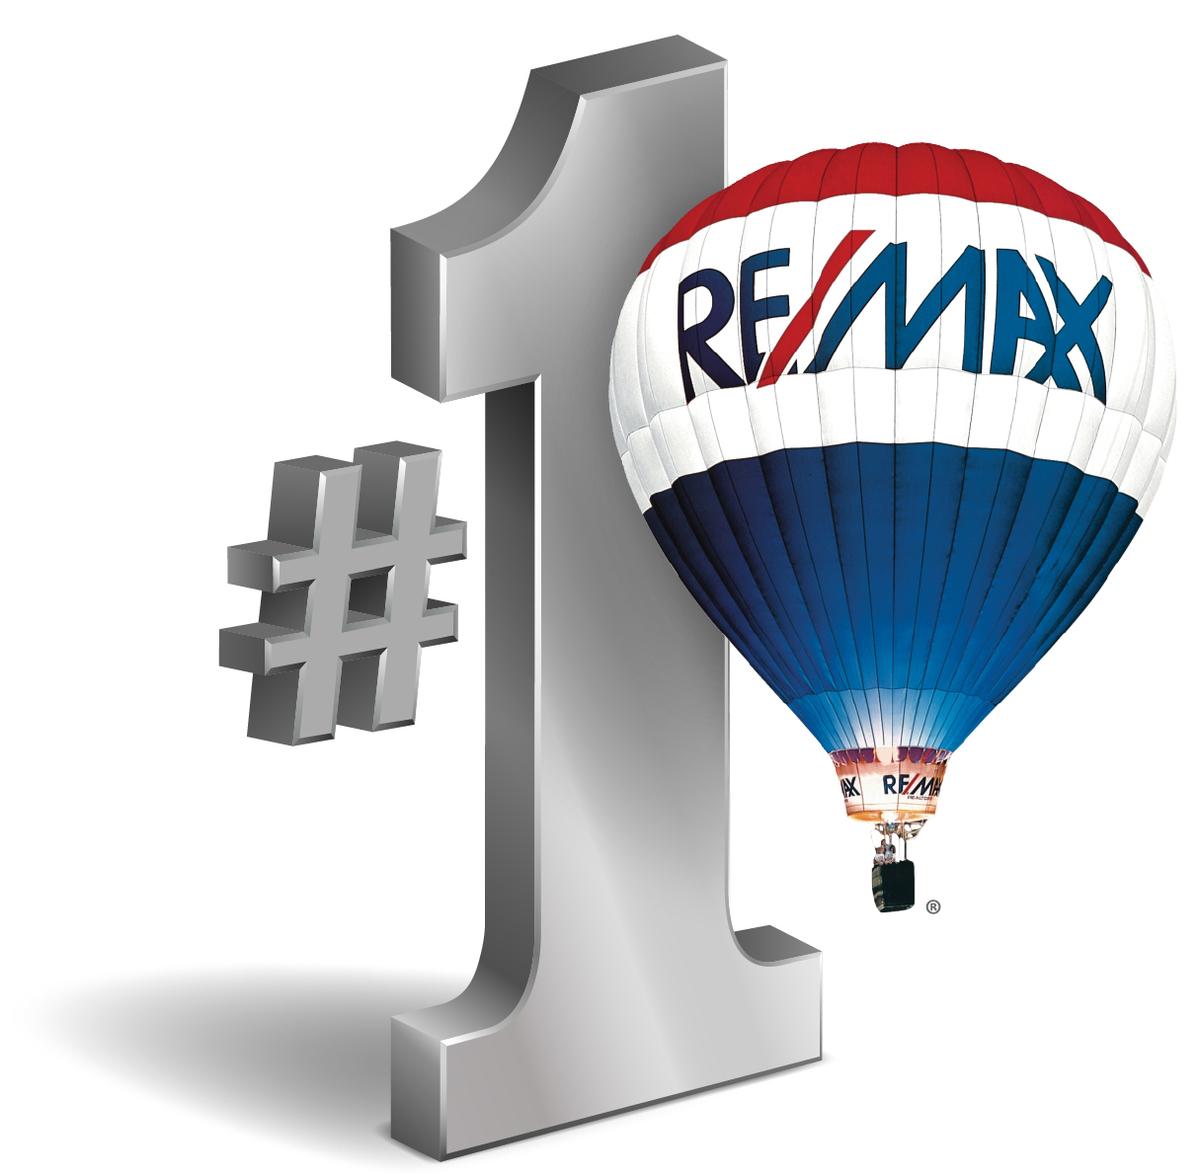 #1 Remax